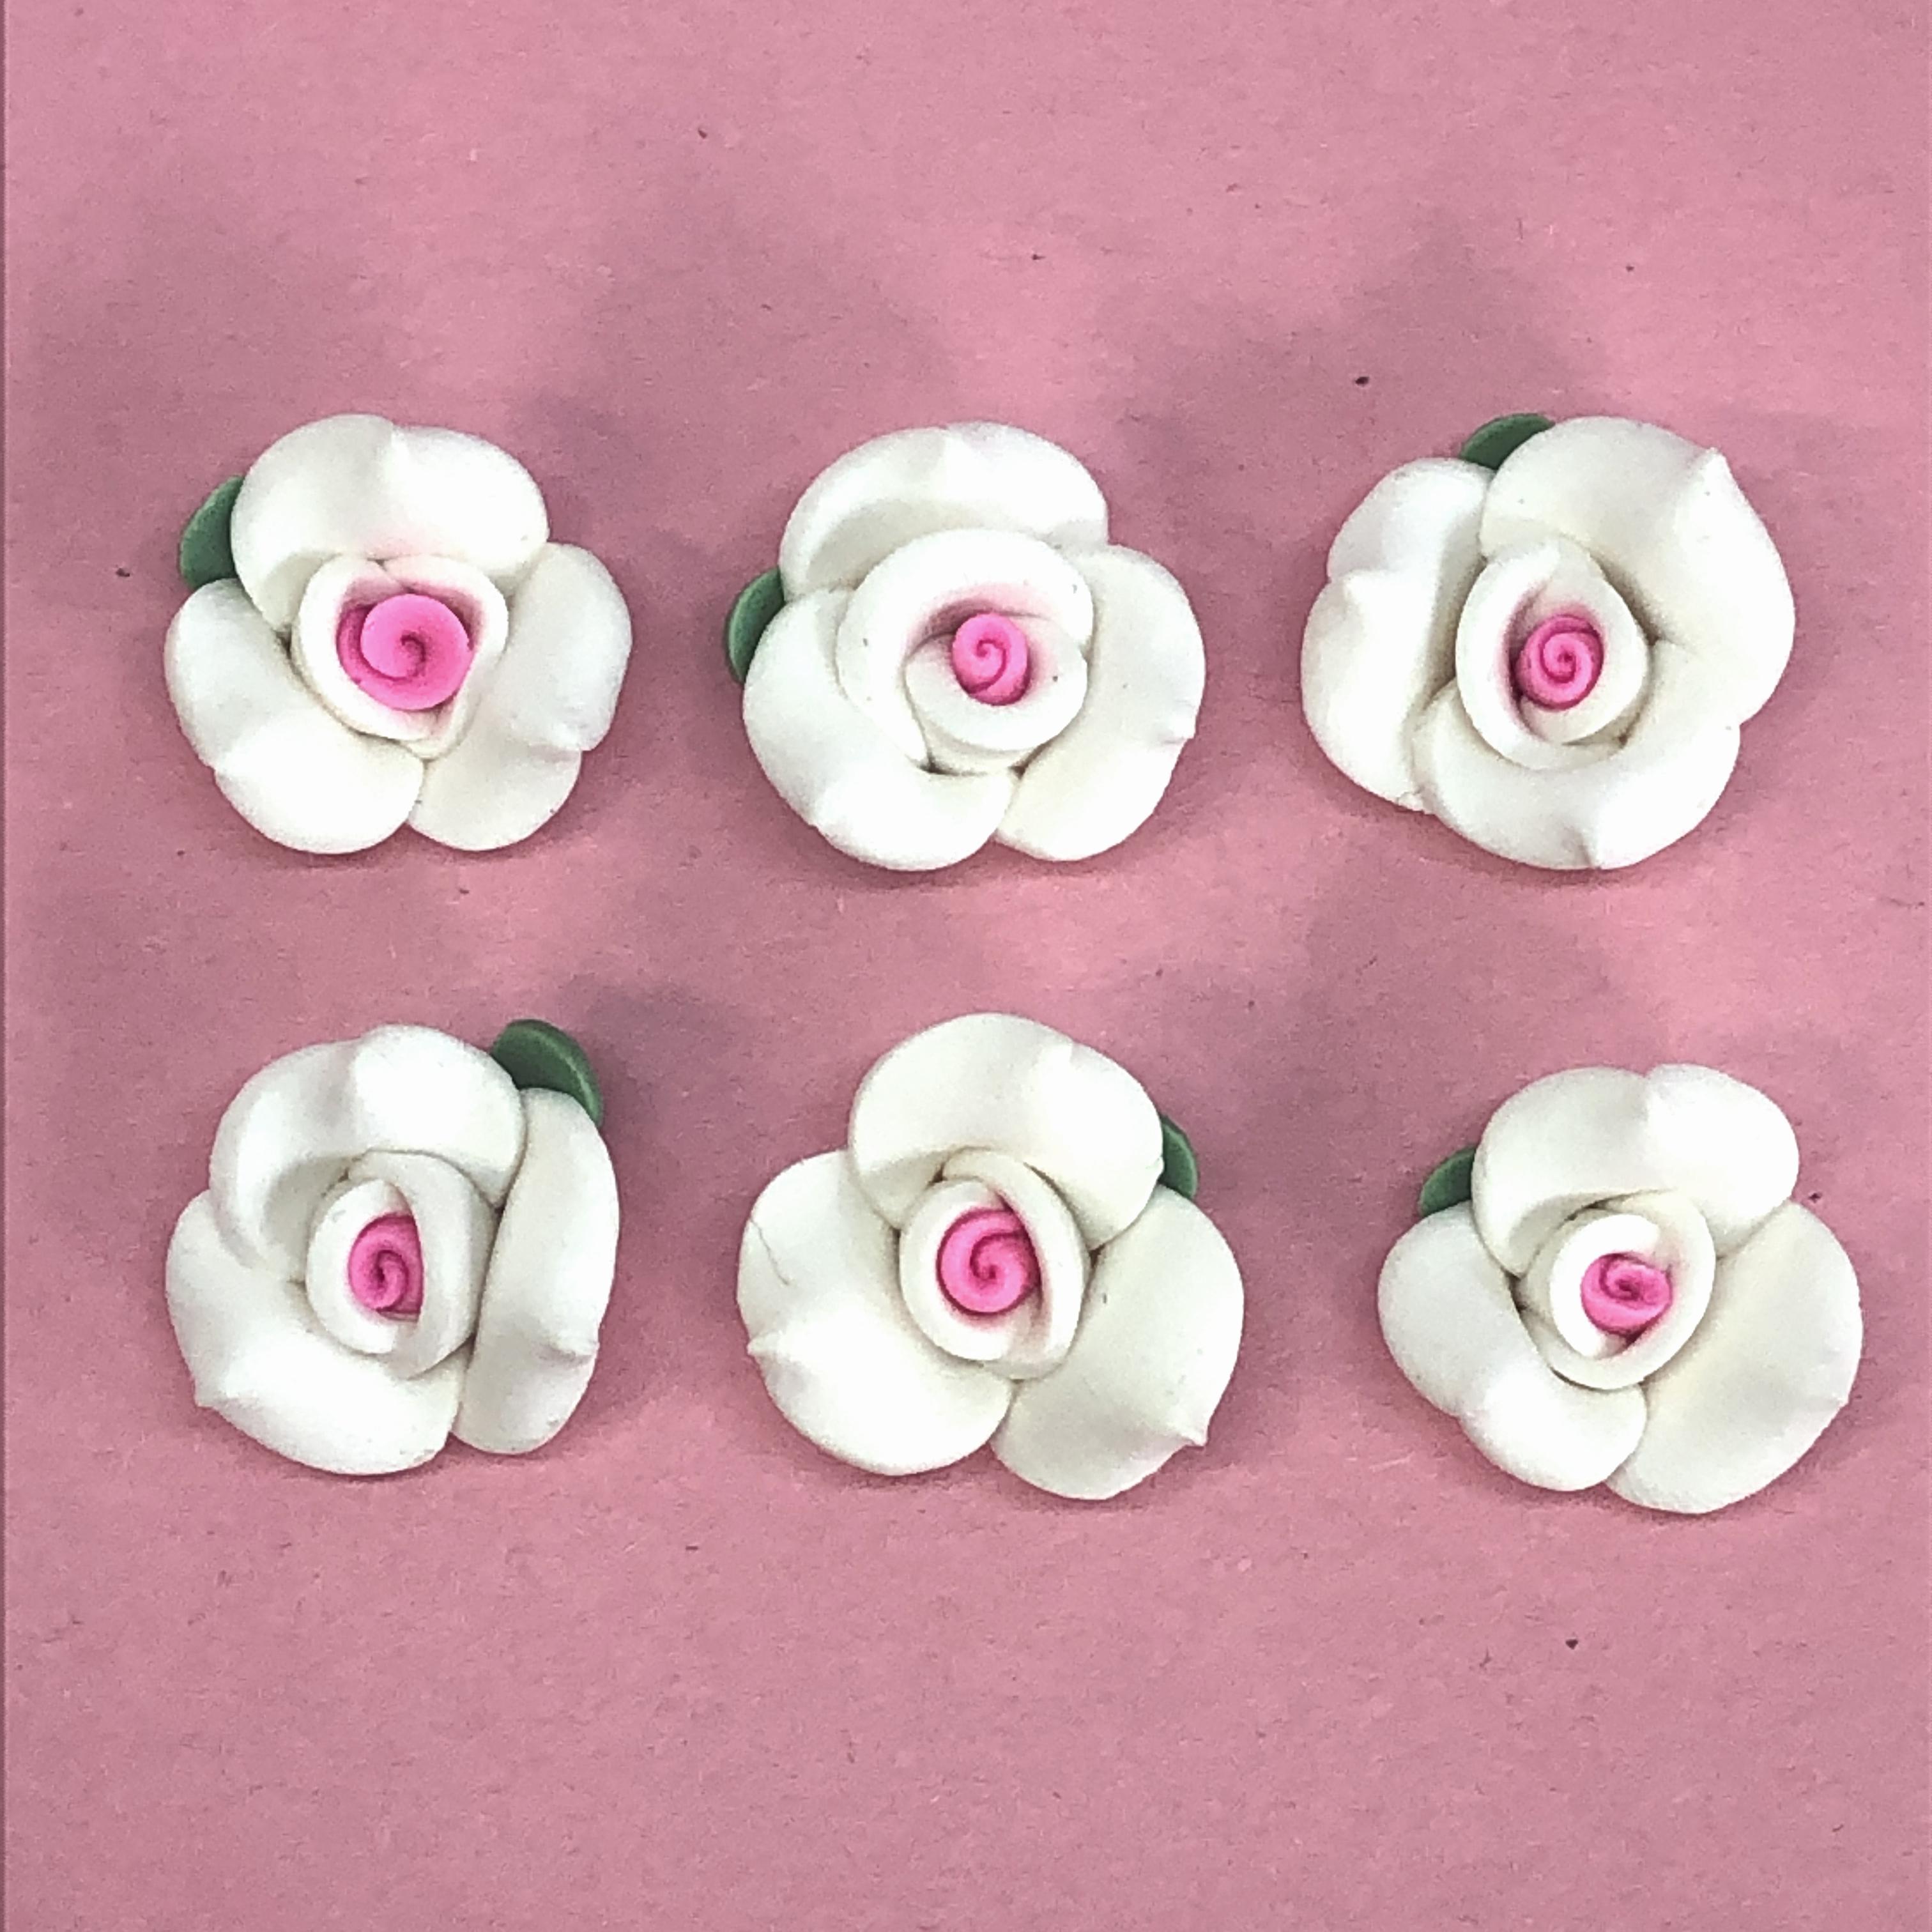 8mm White Ceramic Rose Cabochons Flowers Flat Backs Cameos w Green Leaf Qty 6